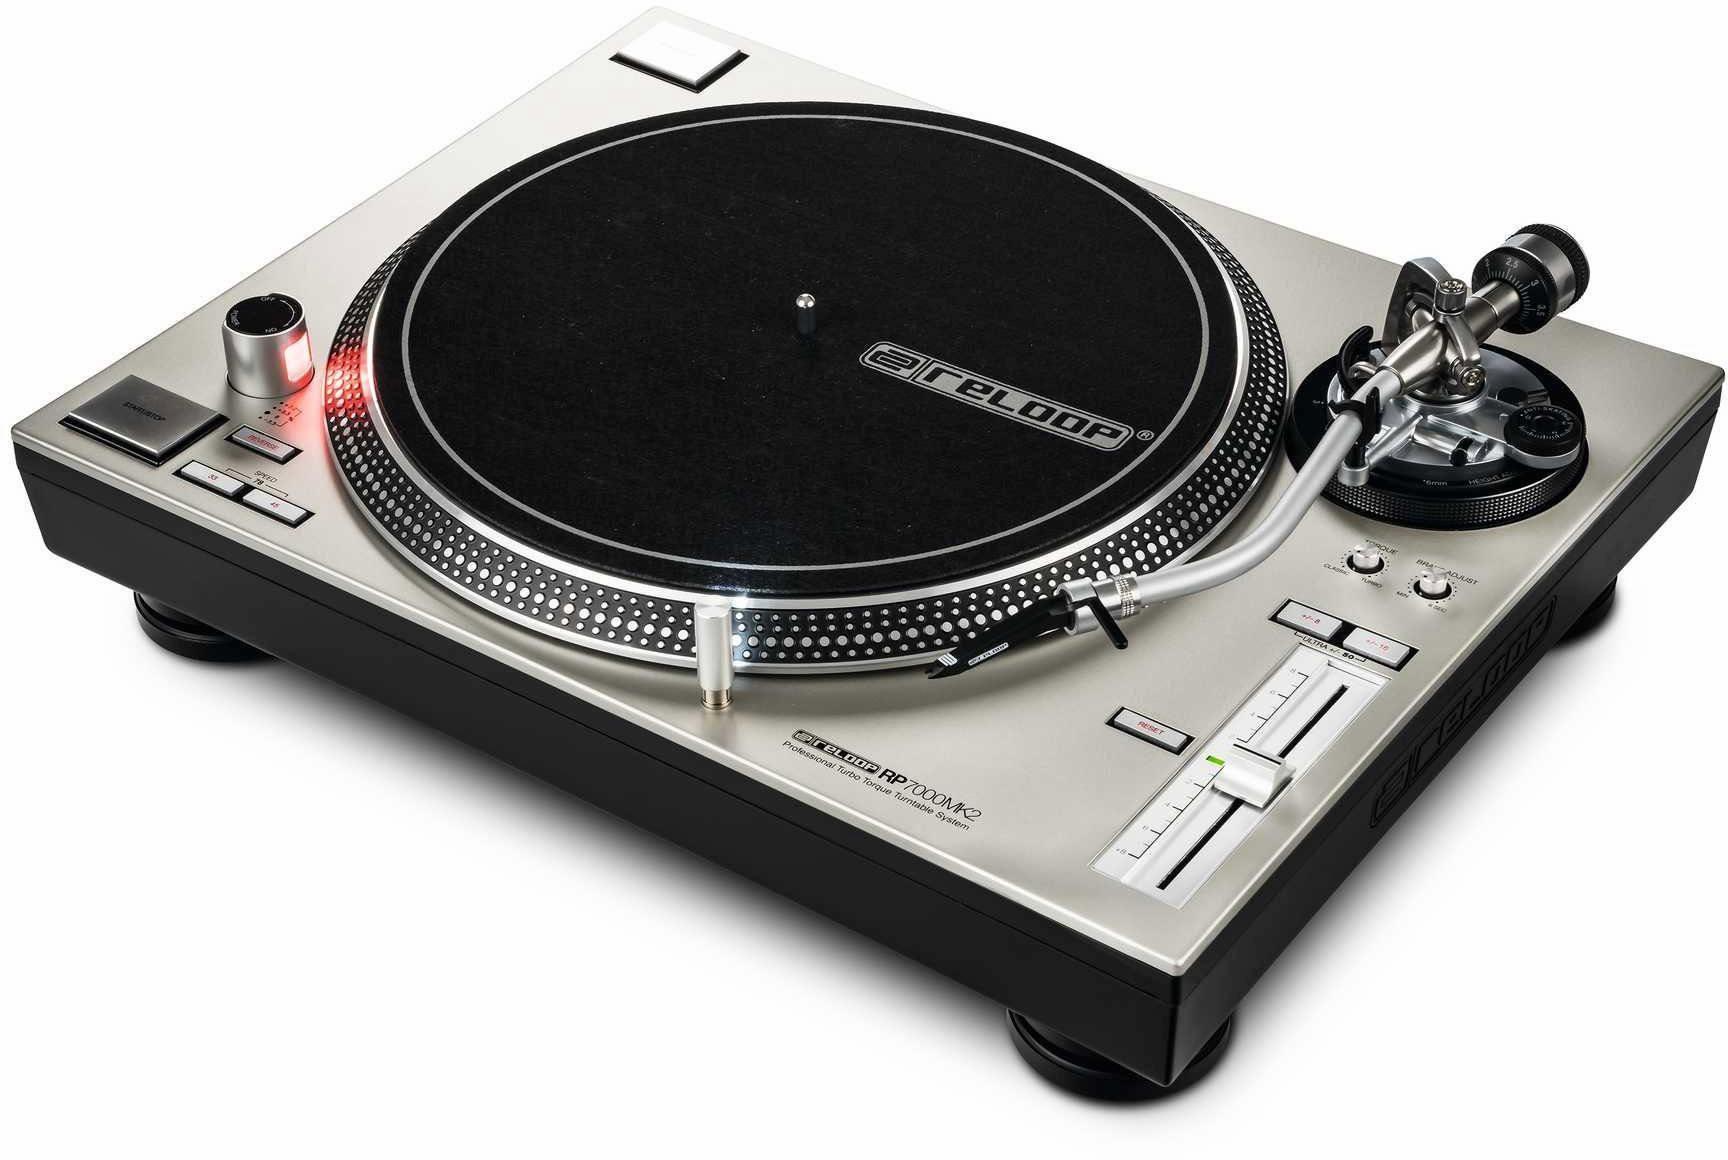 Reloop DJ Plattenspieler, »RP - 7000 MK2 silver«